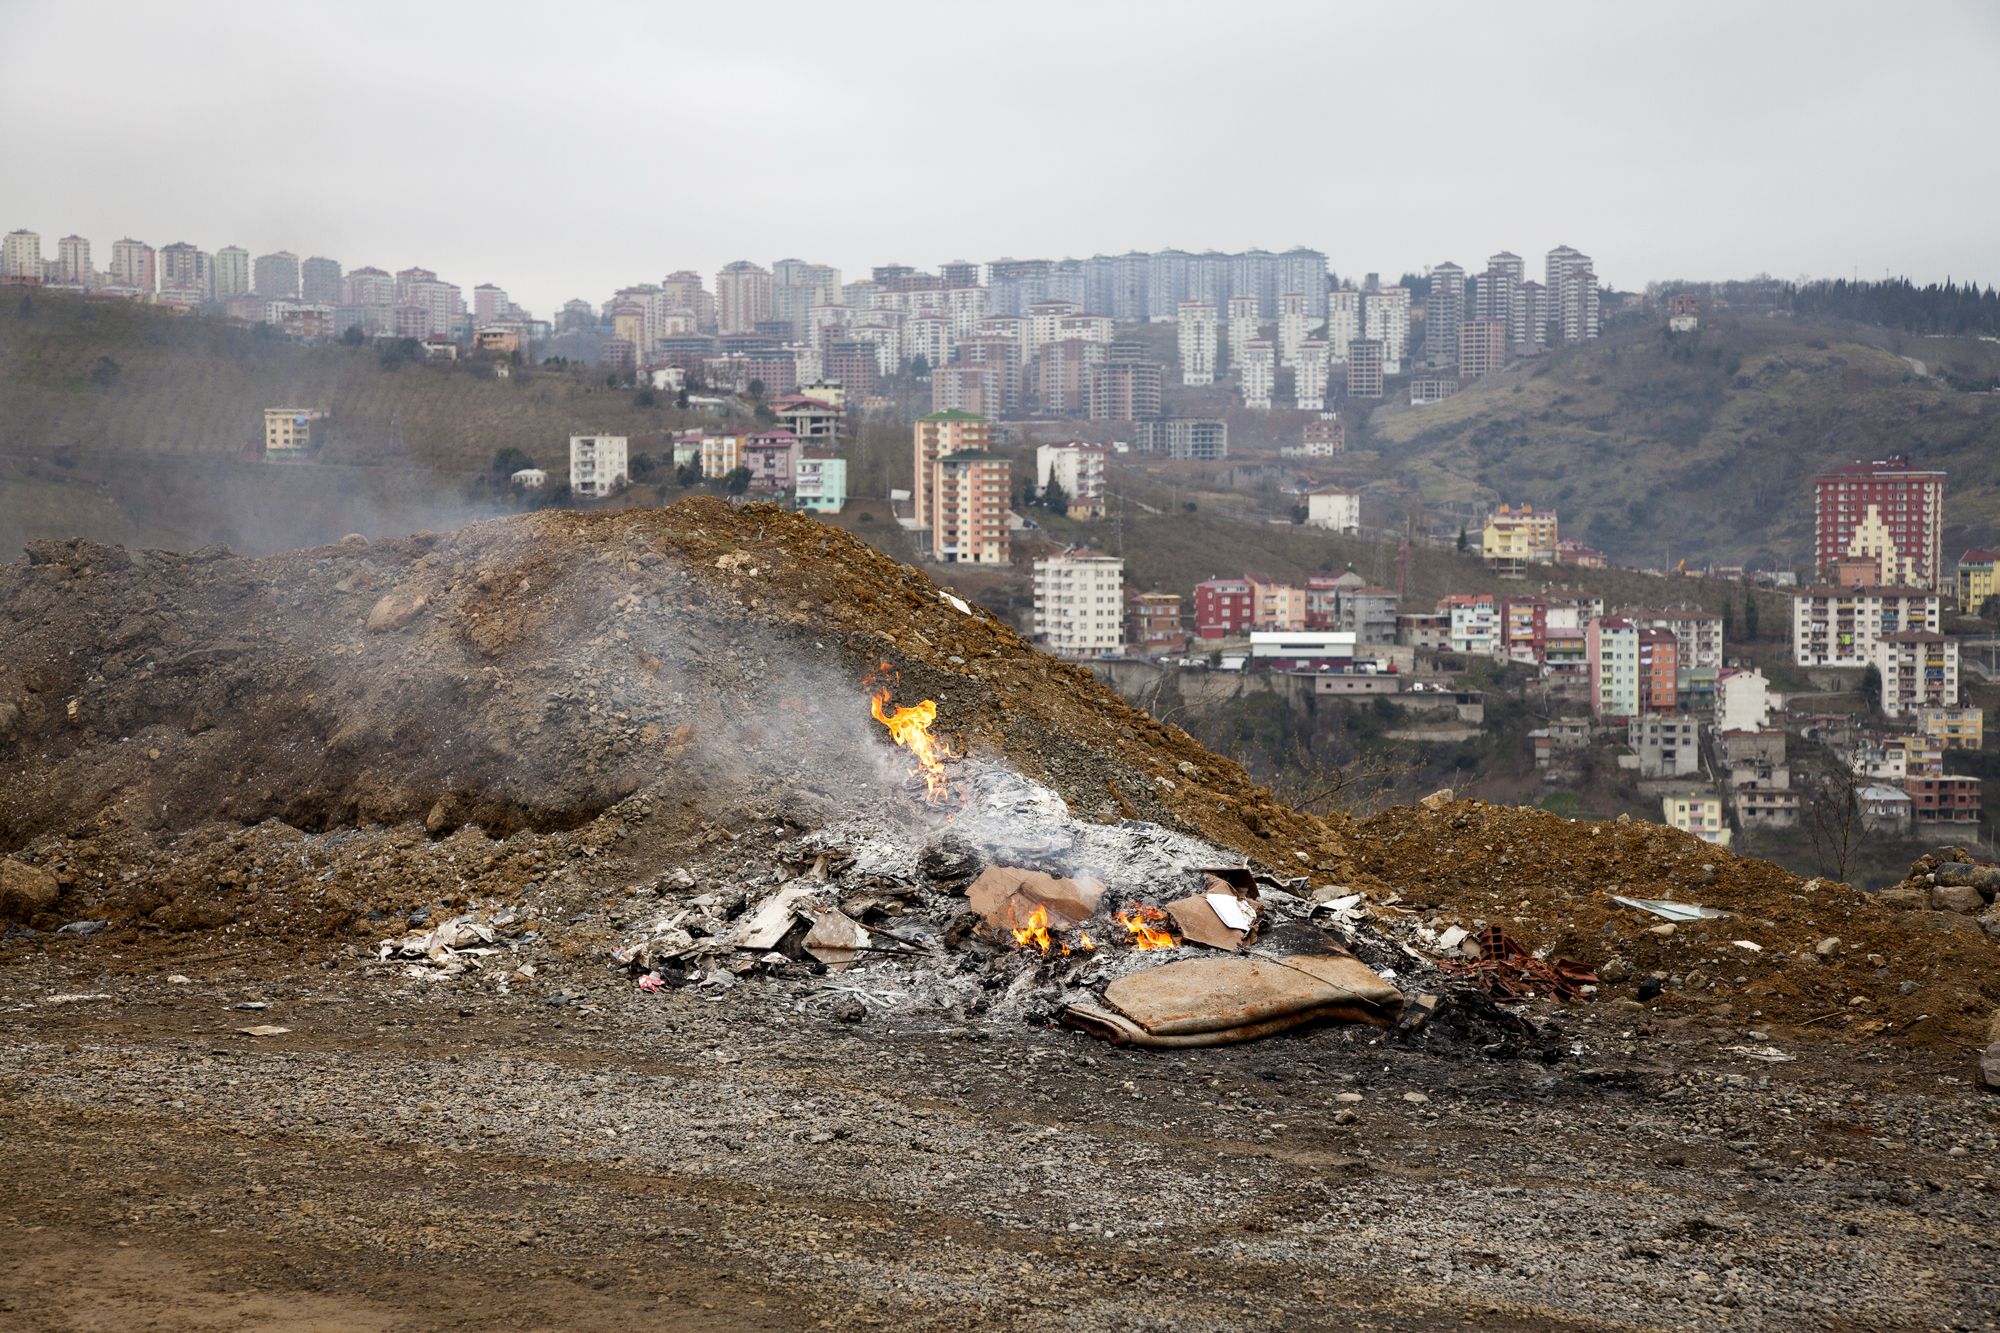 Volkan Kiziltunc_The Smoke #2